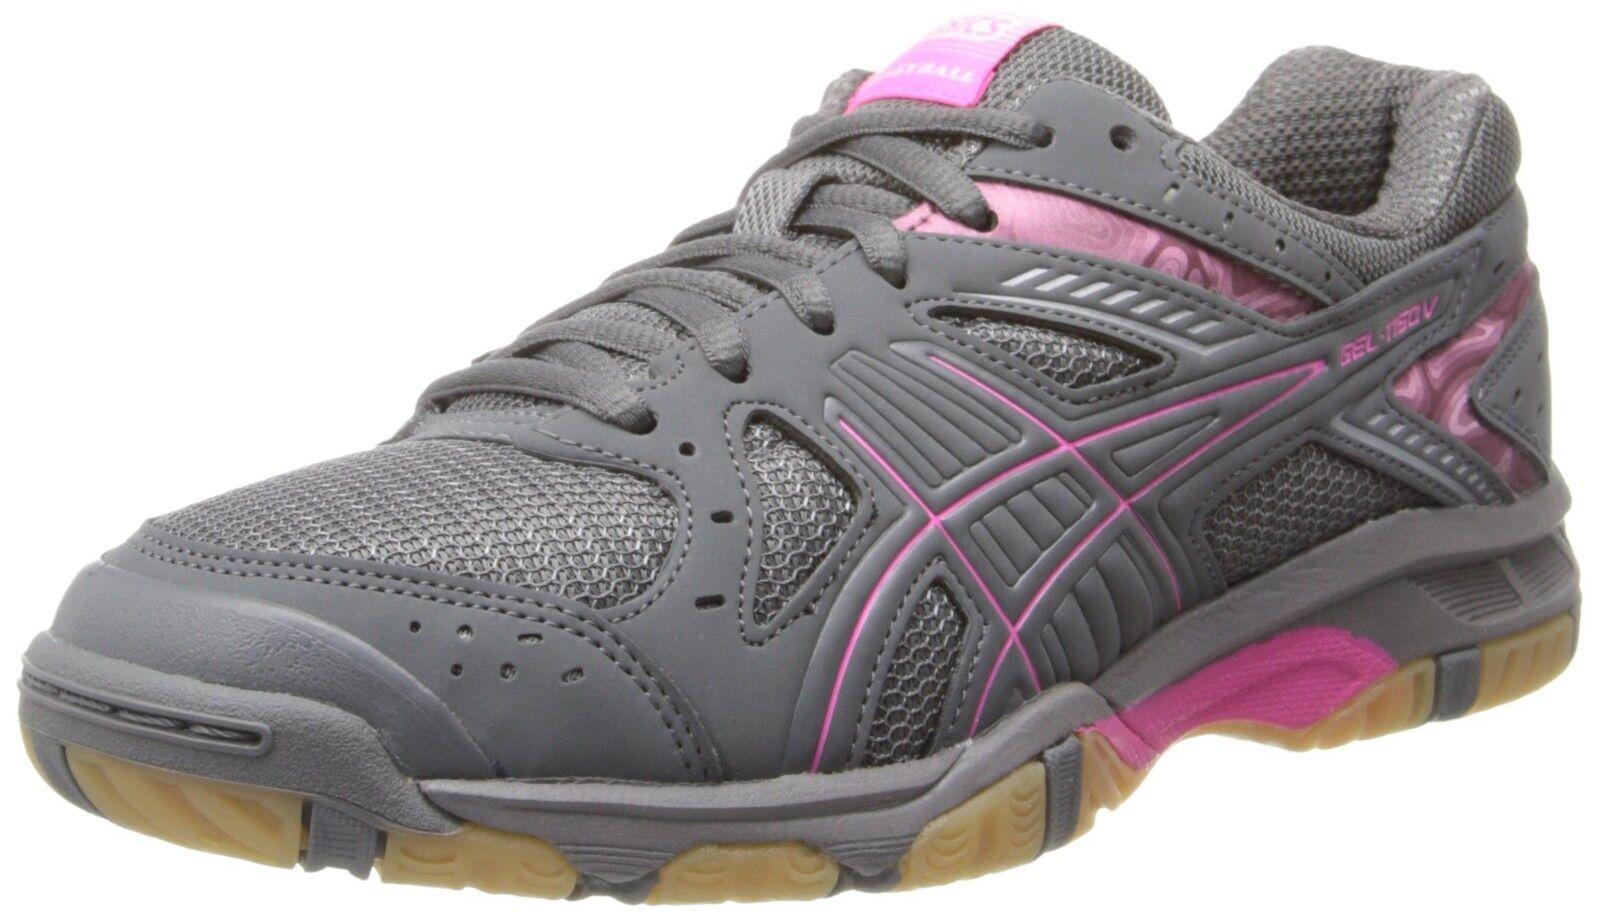 Asics Gel 1150 V Mujer Volleyball interior zapatos zapatos zapatos talla 7 rosado gris  bienvenido a comprar